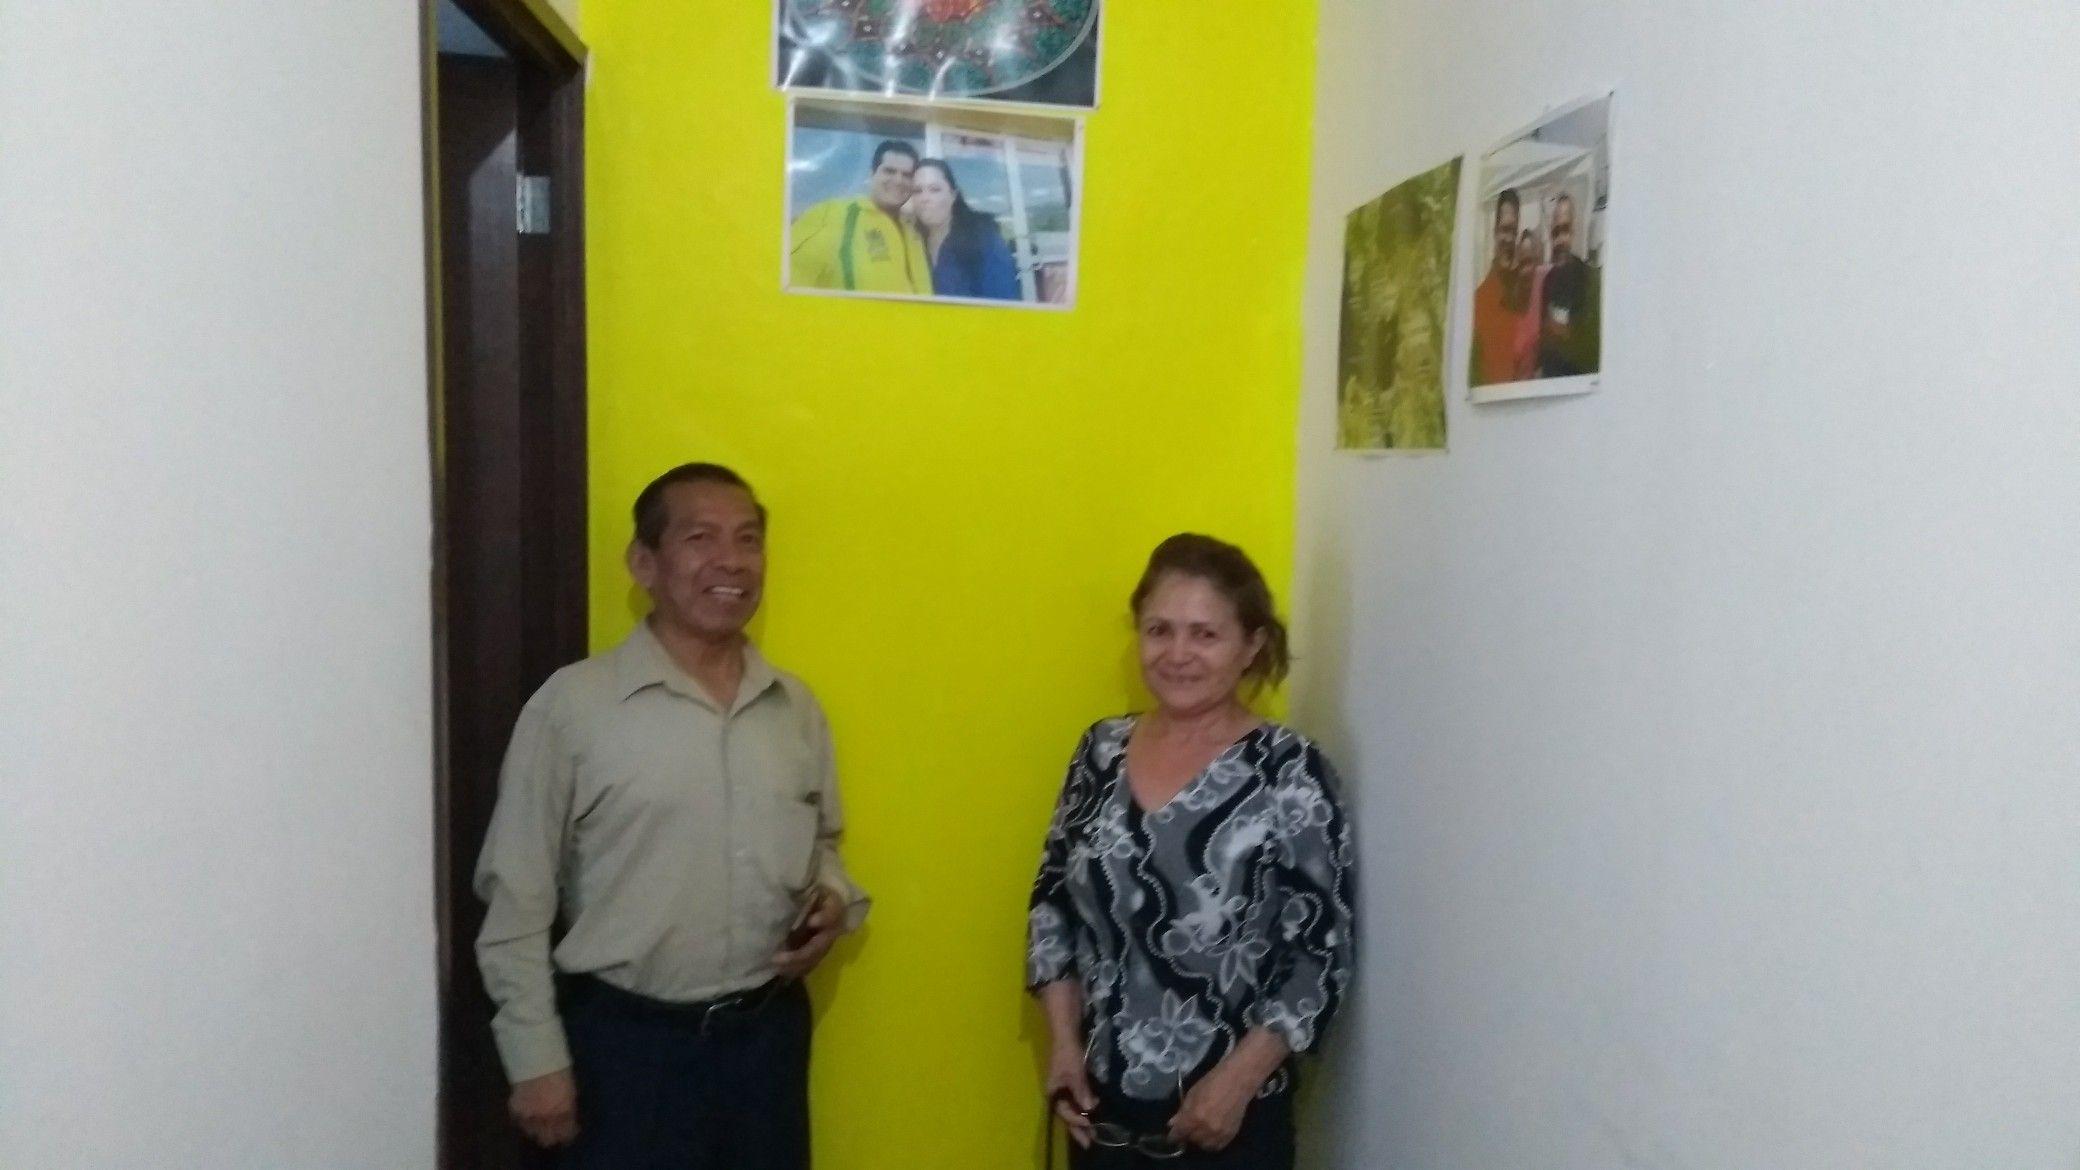 Hostal Casa Anita Guadalajara www.casaanita.com.mx Teléfono: +52.33.38250405 WhatsApp:+52.33.20711937